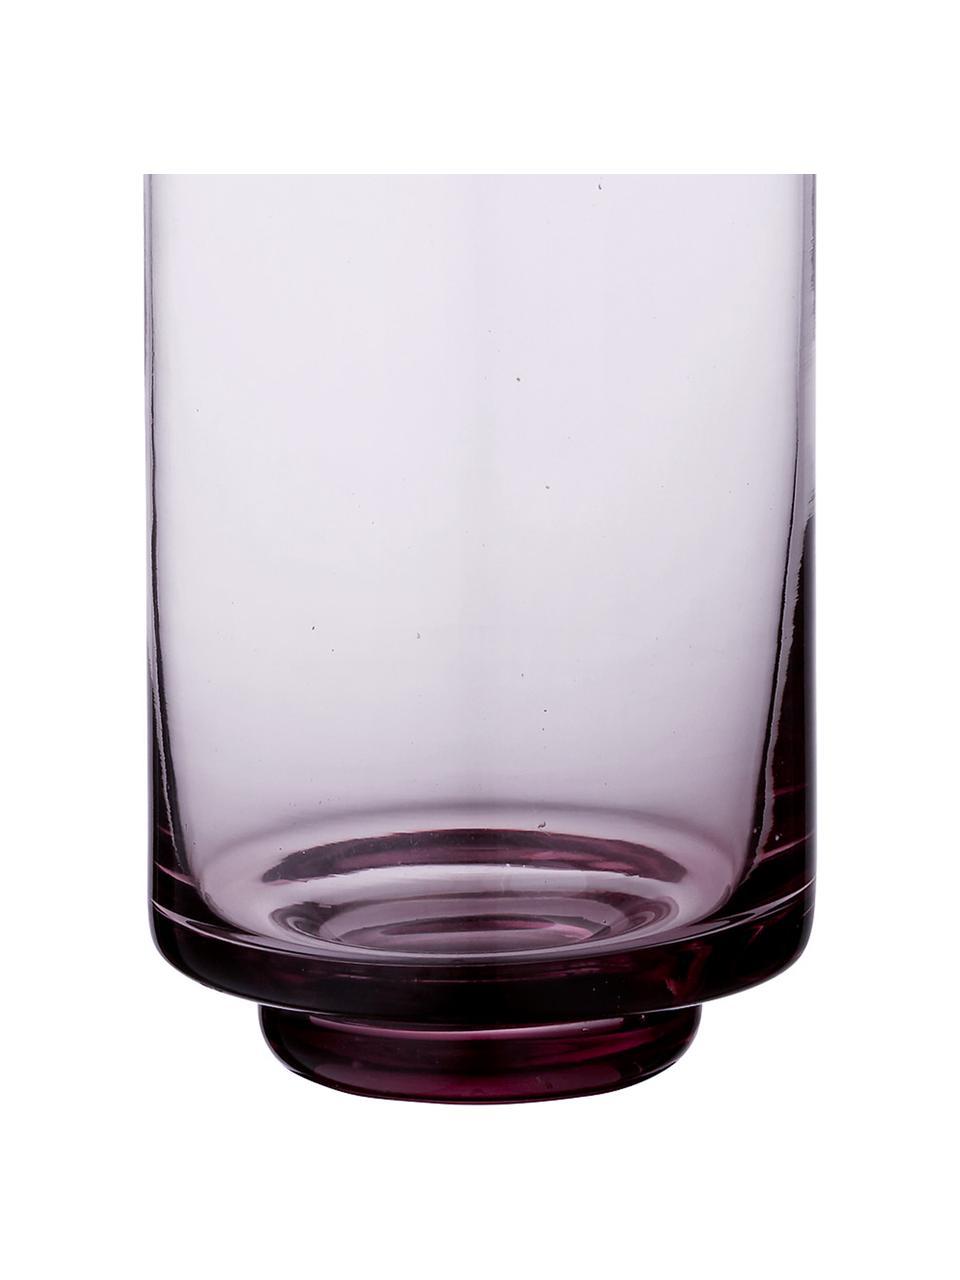 Vaso decorativo in vetro soffiato Hedria, Vetro, Rosa, Ø 11 x Alt. 30 cm